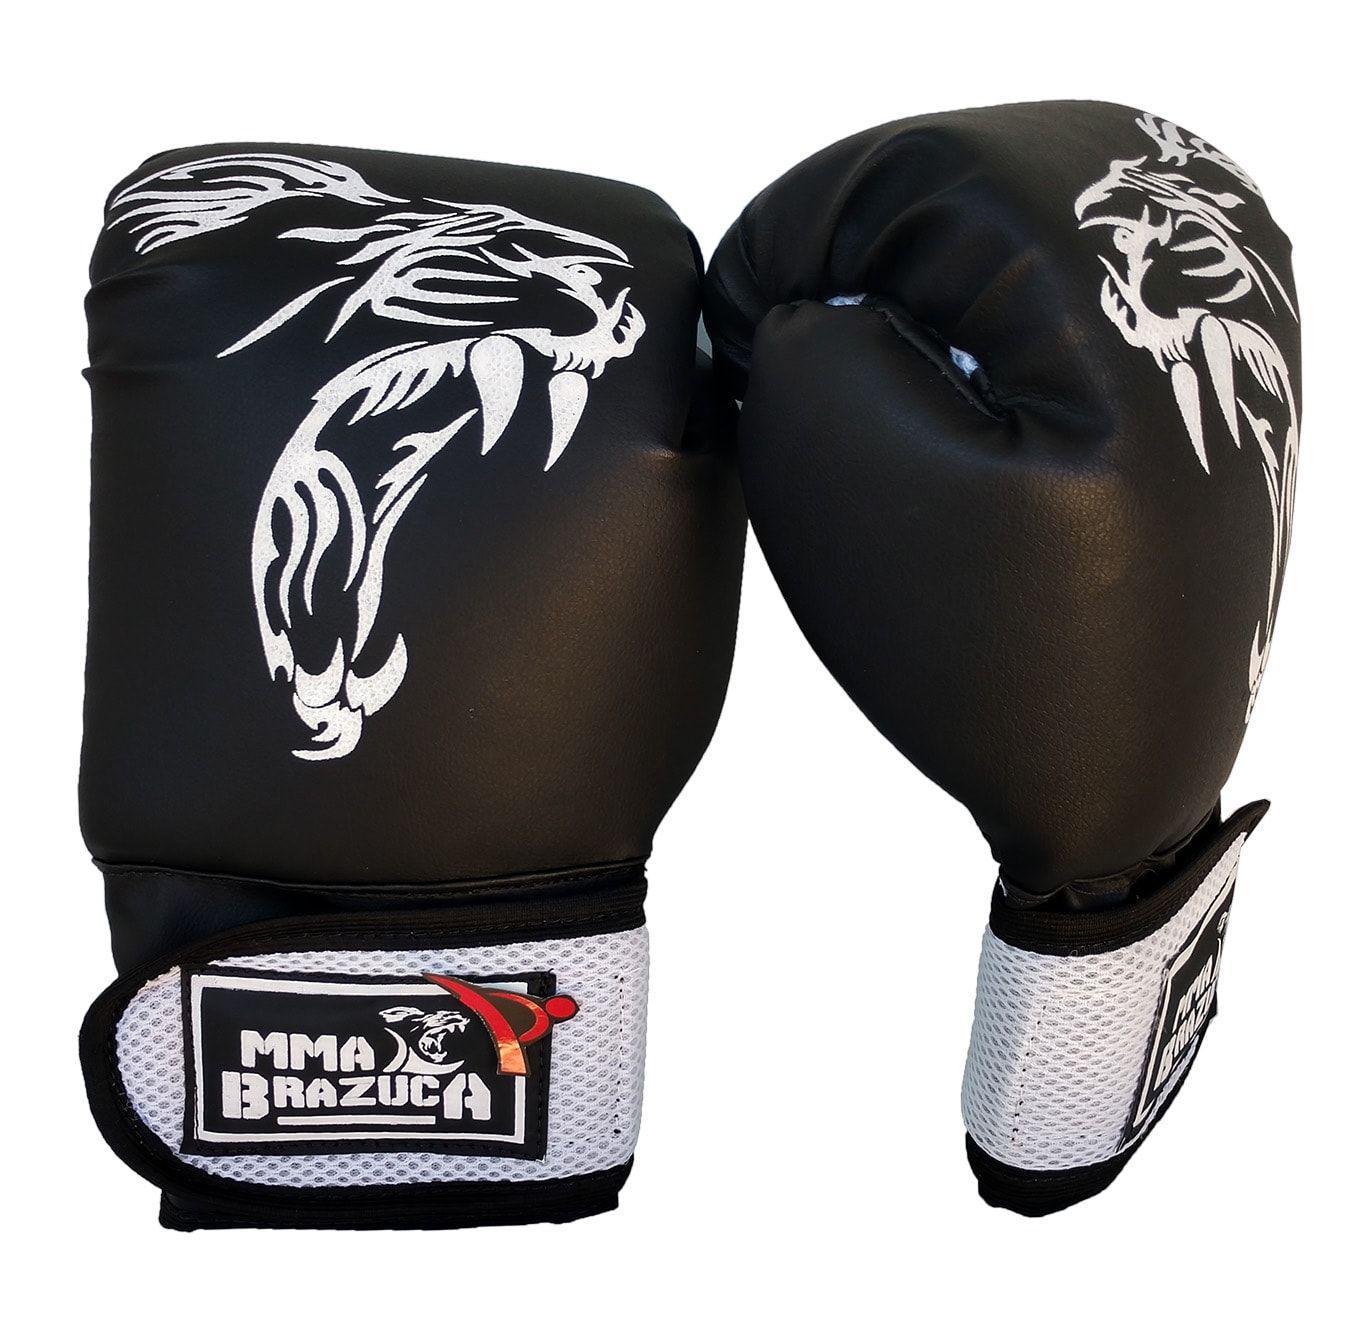 15b533905 Kit de Boxe   Muay Thai 14oz - Preto com Branco - MMA Brazuka - Kit ...